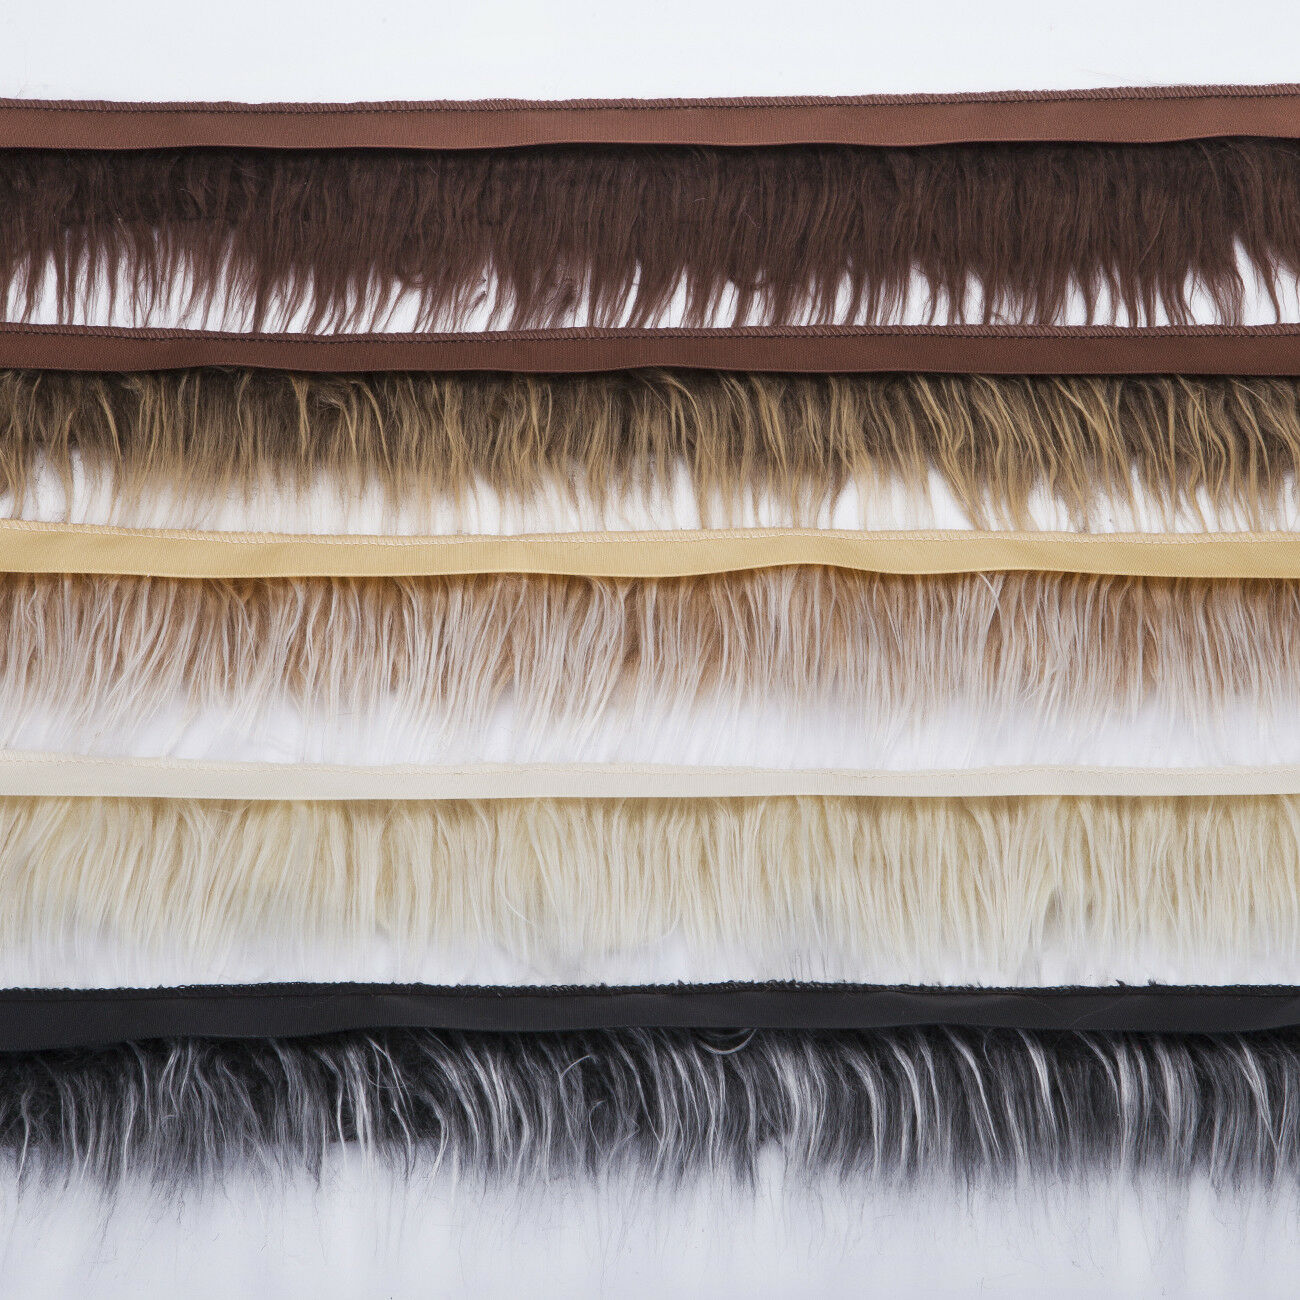 Neotrims Fake Fur Trimming Ribbon Trim Silky Soft Handle Furry Natural Texture